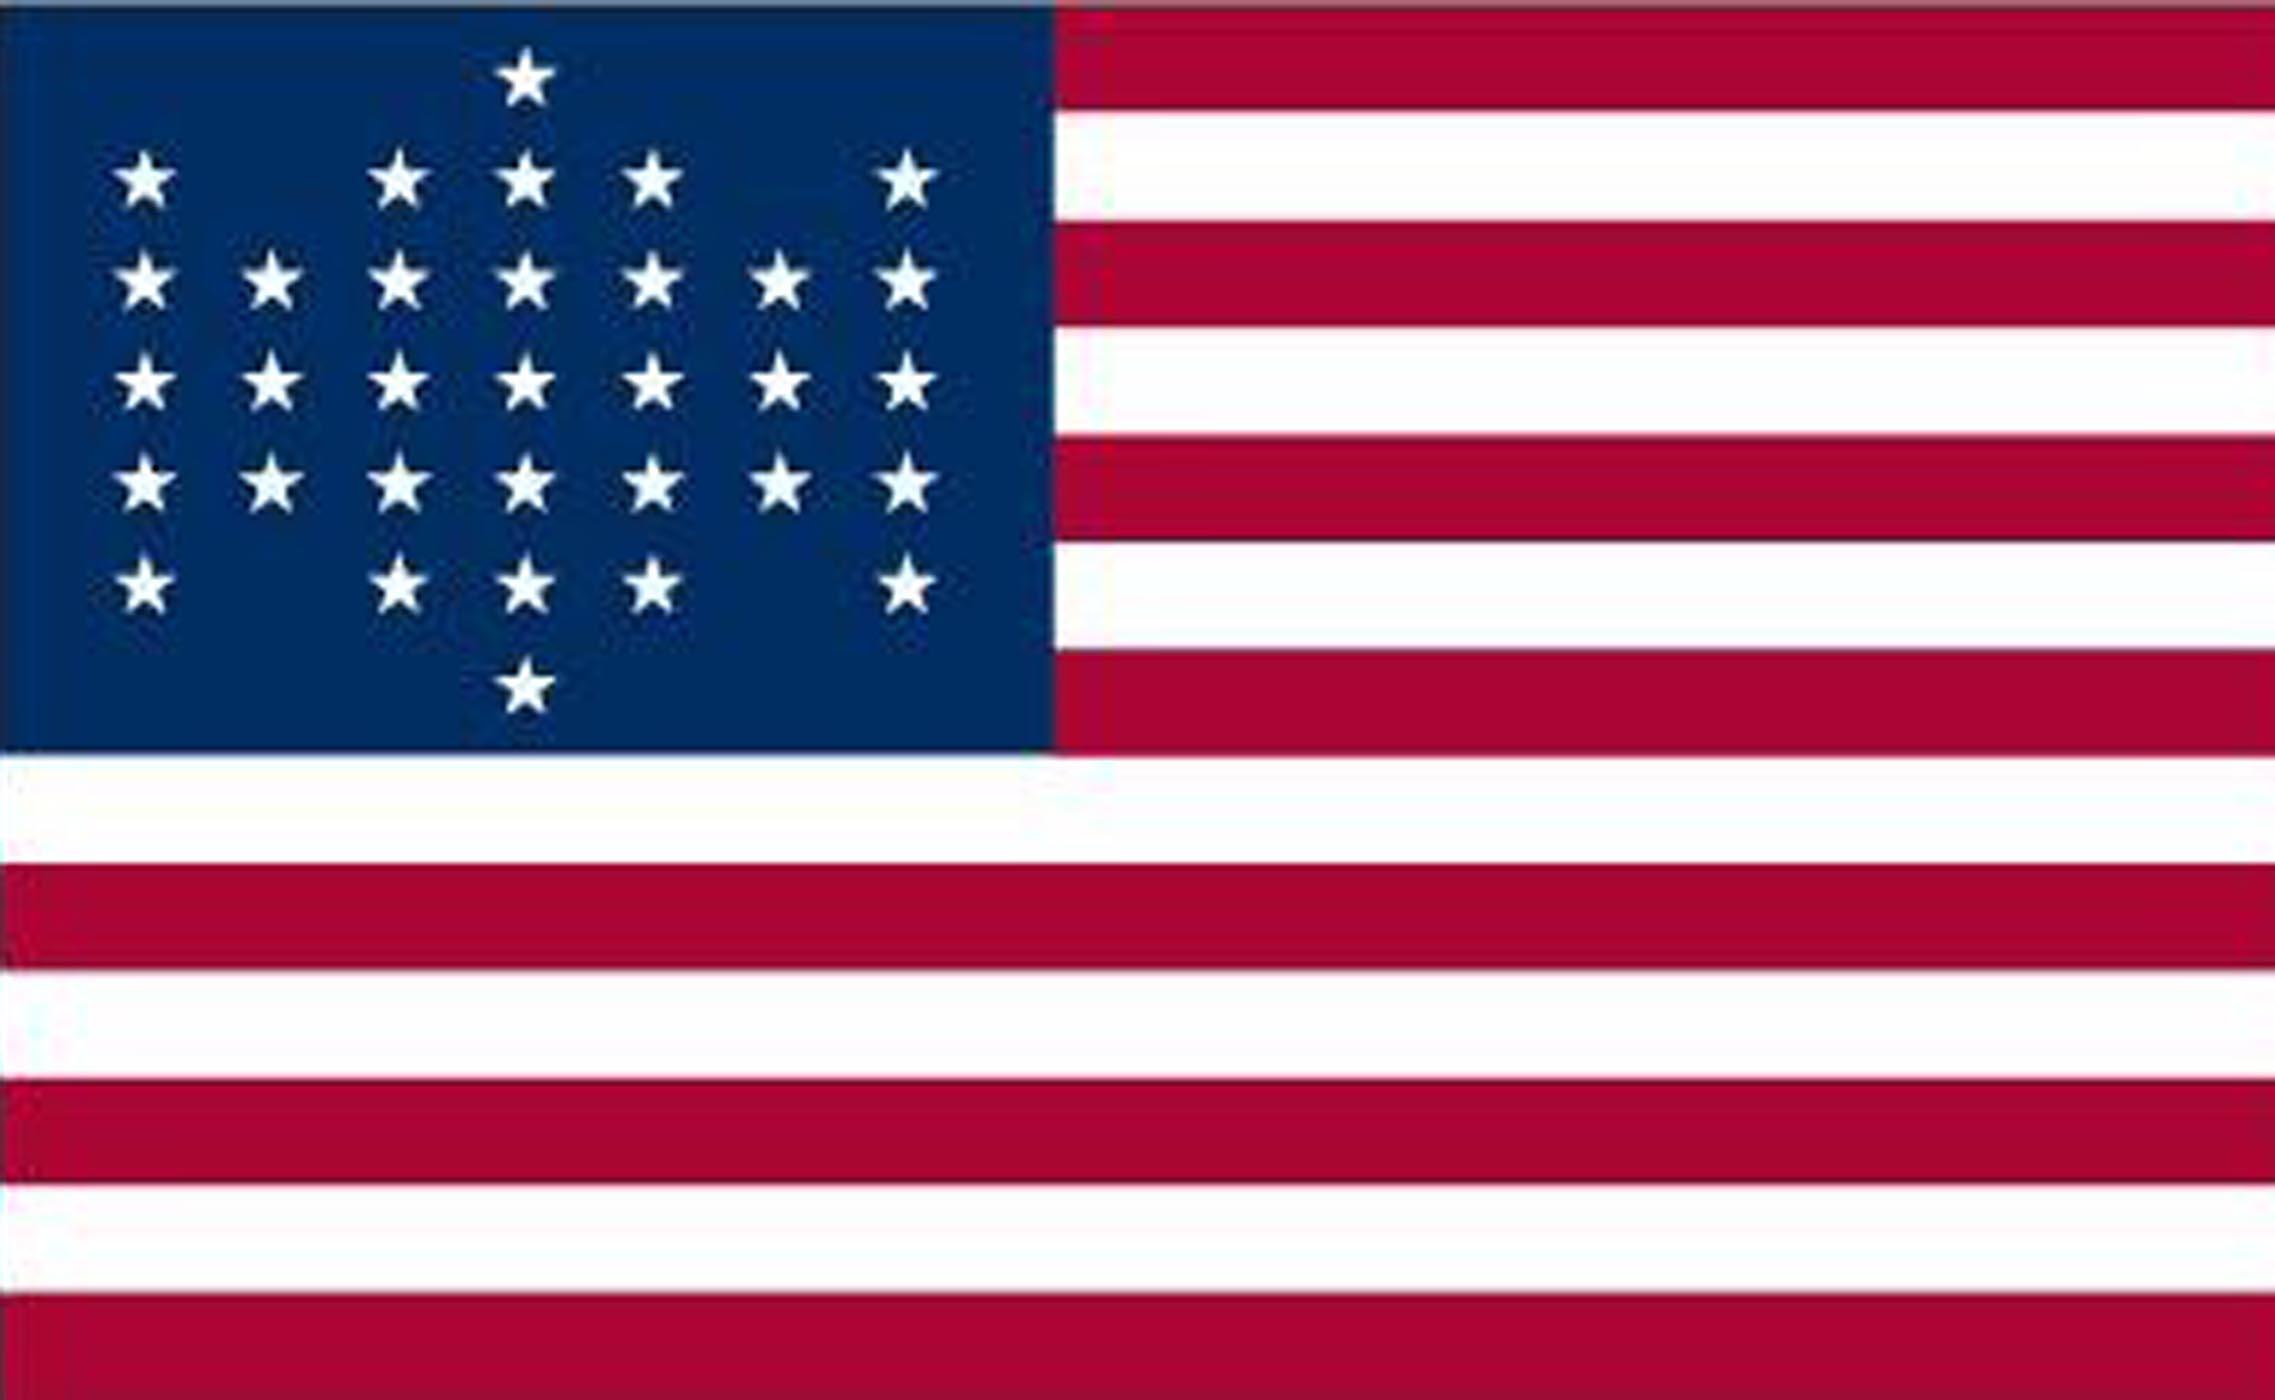 Rhode Island Civil War Flags